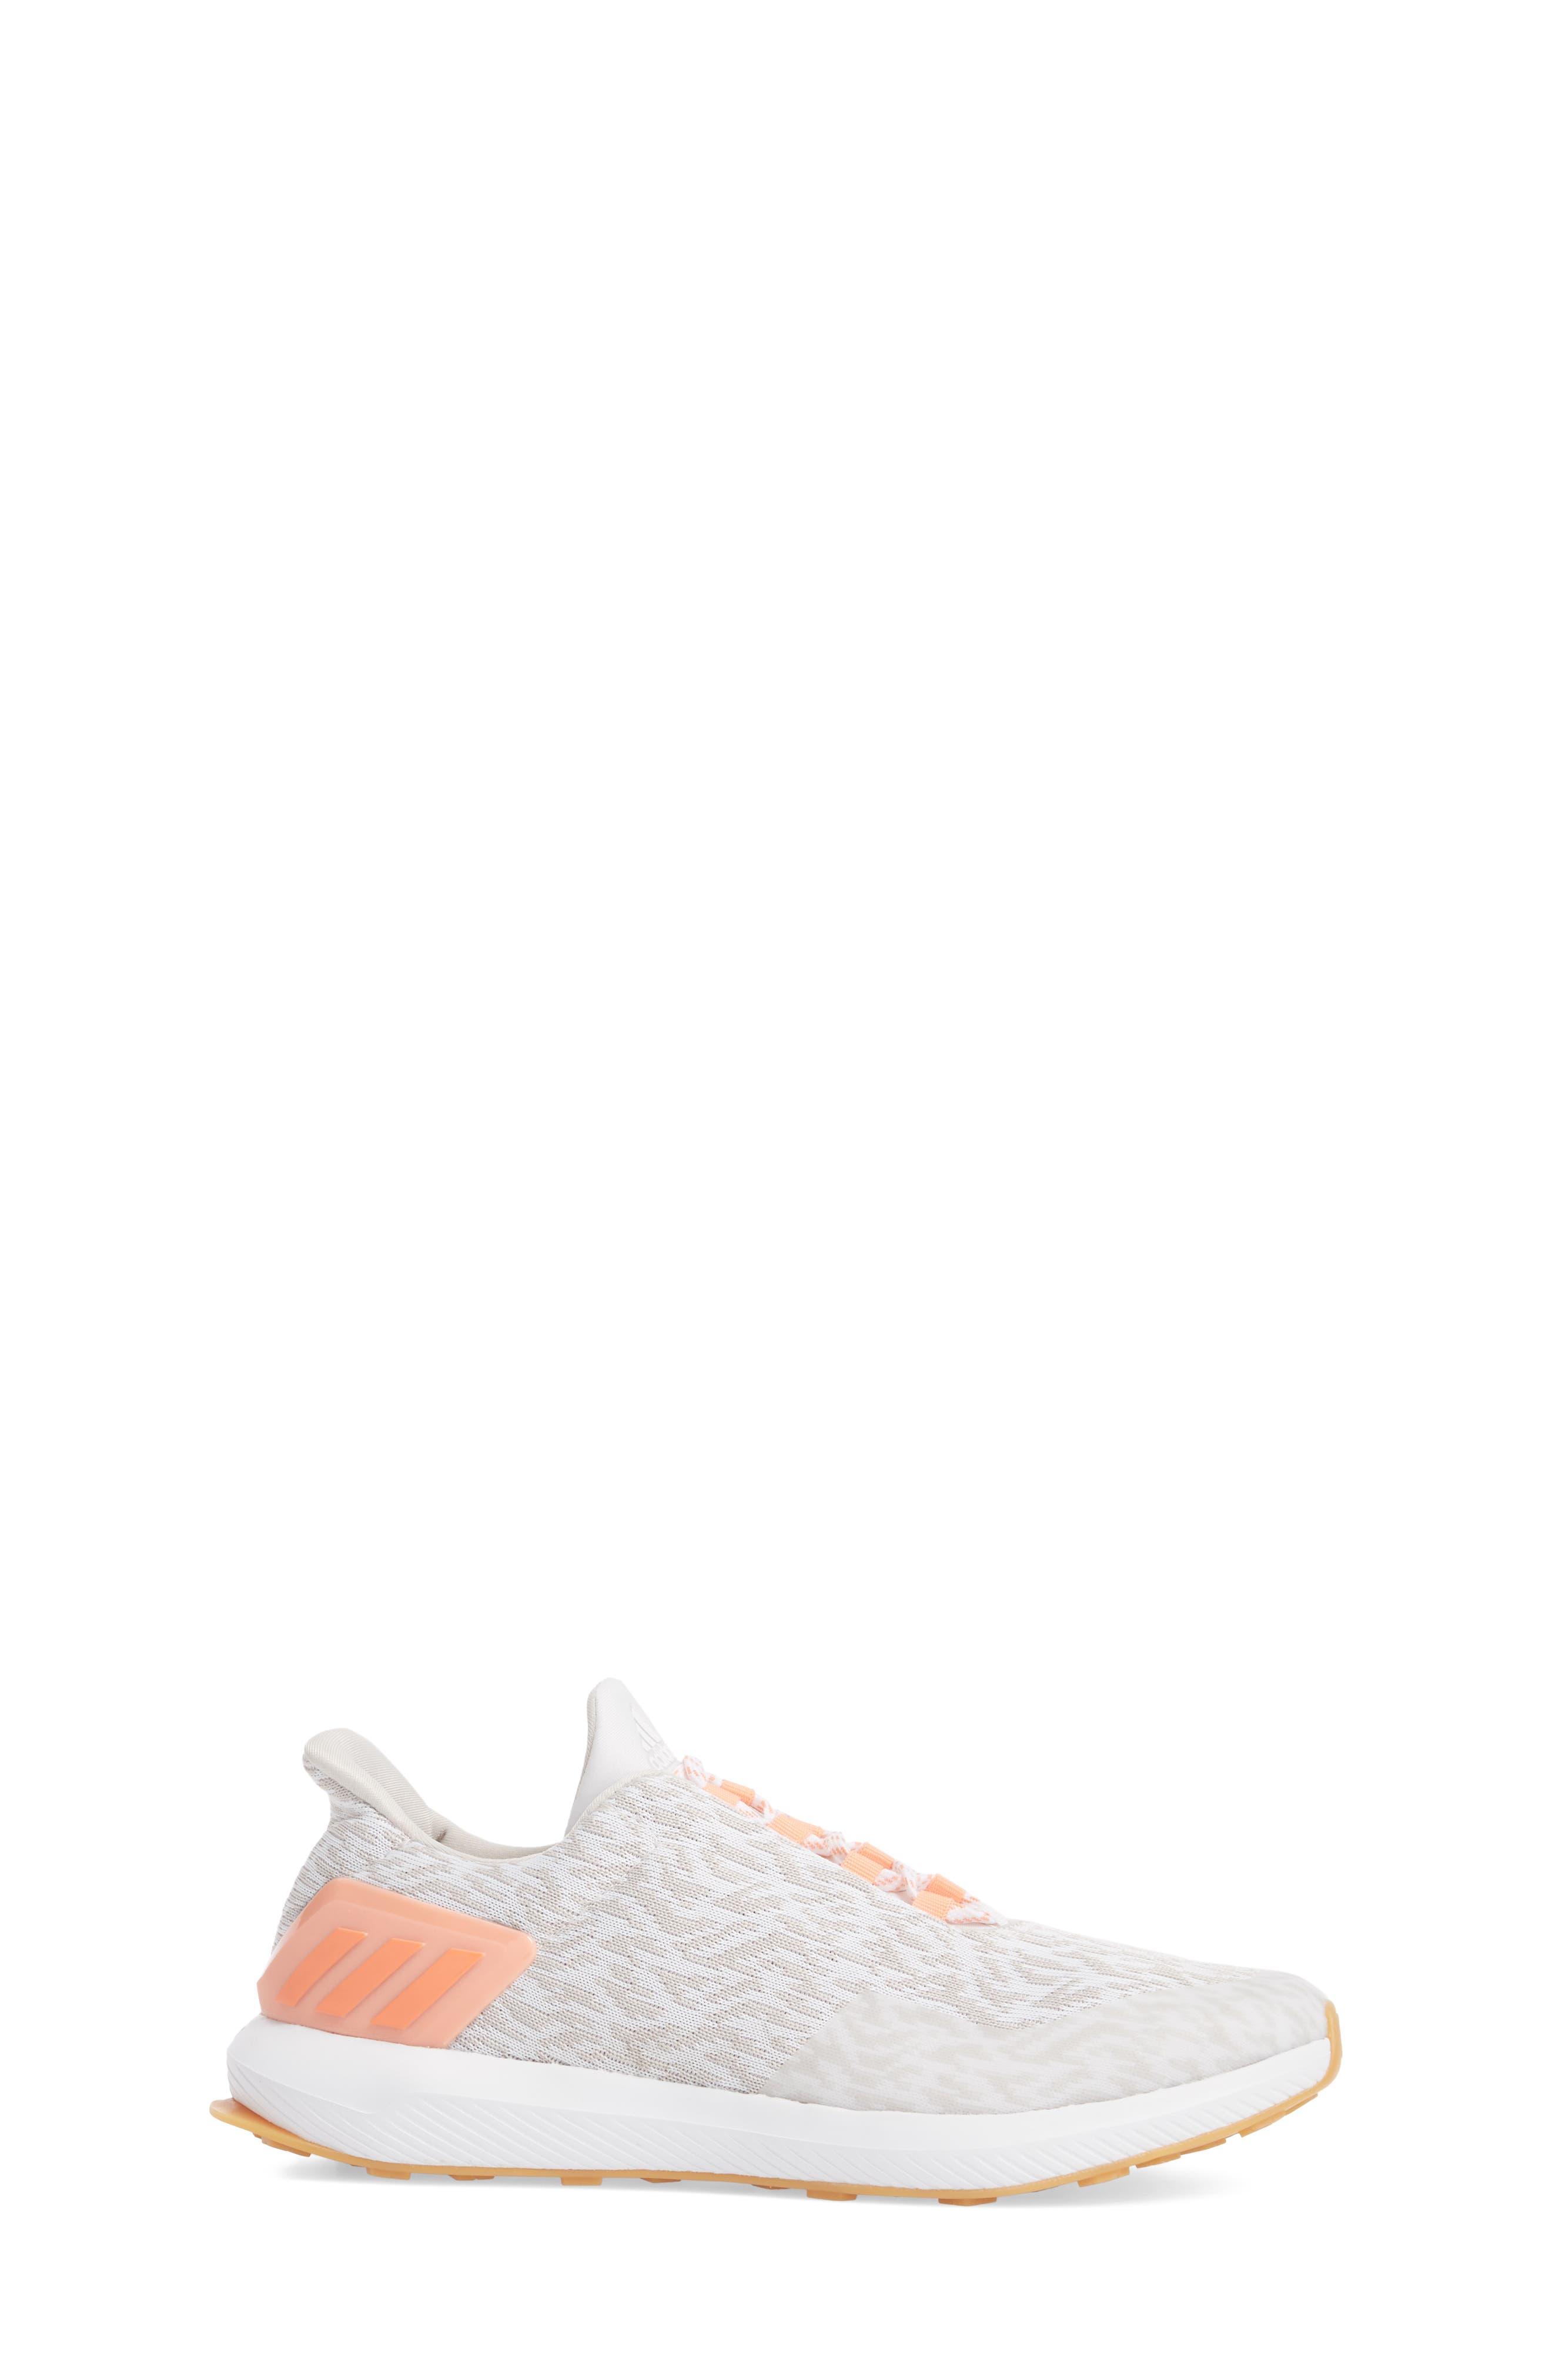 RapidaRun Uncaged Sneaker,                             Alternate thumbnail 3, color,                             White / Pearl/ Coral